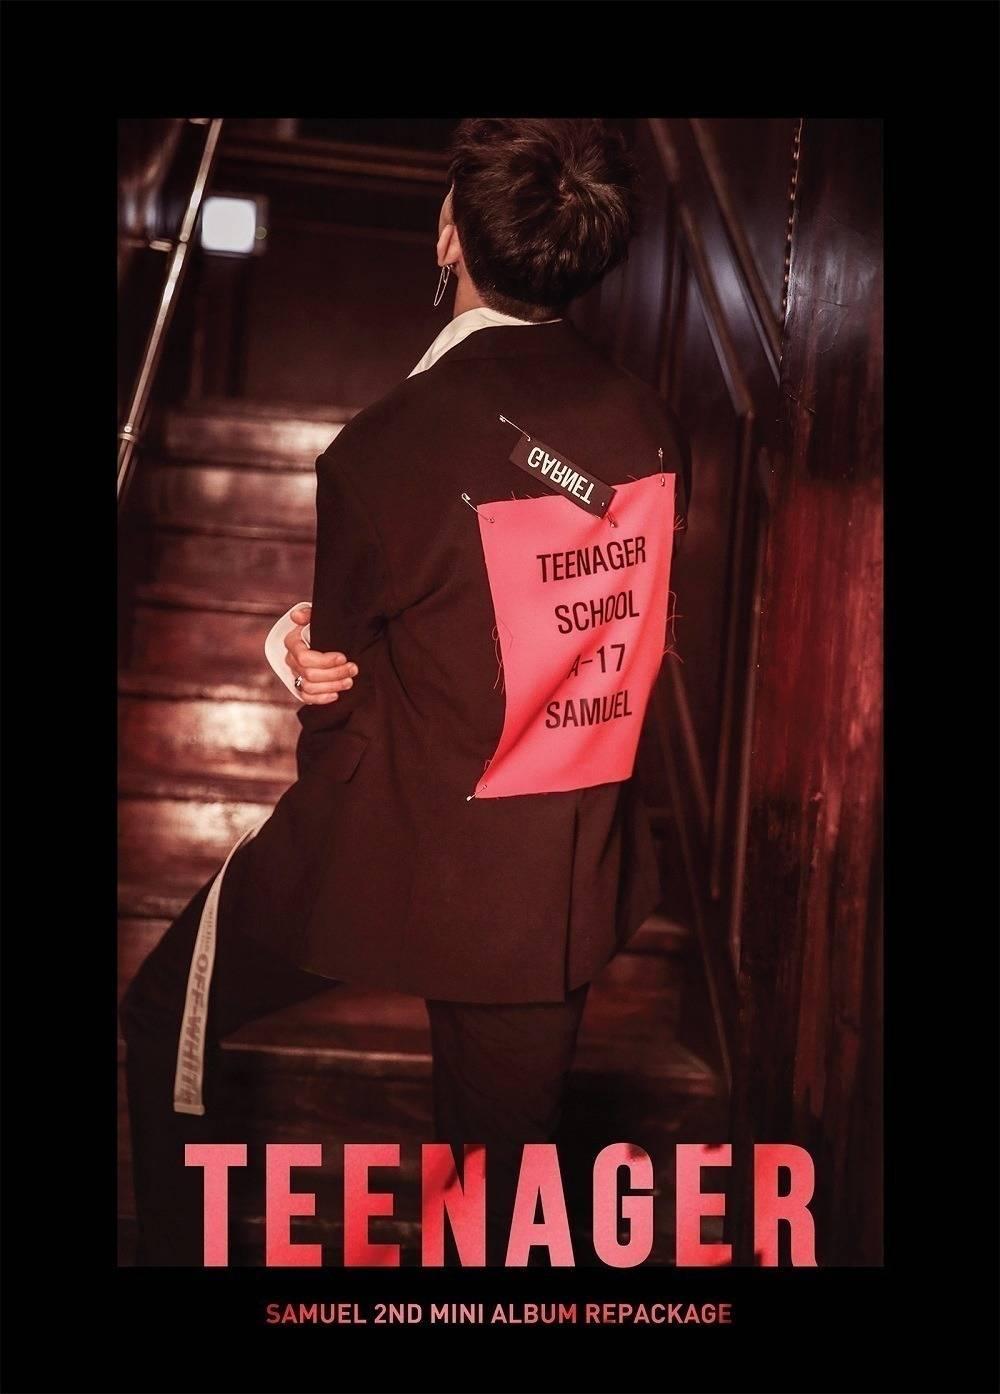 Samuel - 2nd Mini Album Repackage: Teenager CD